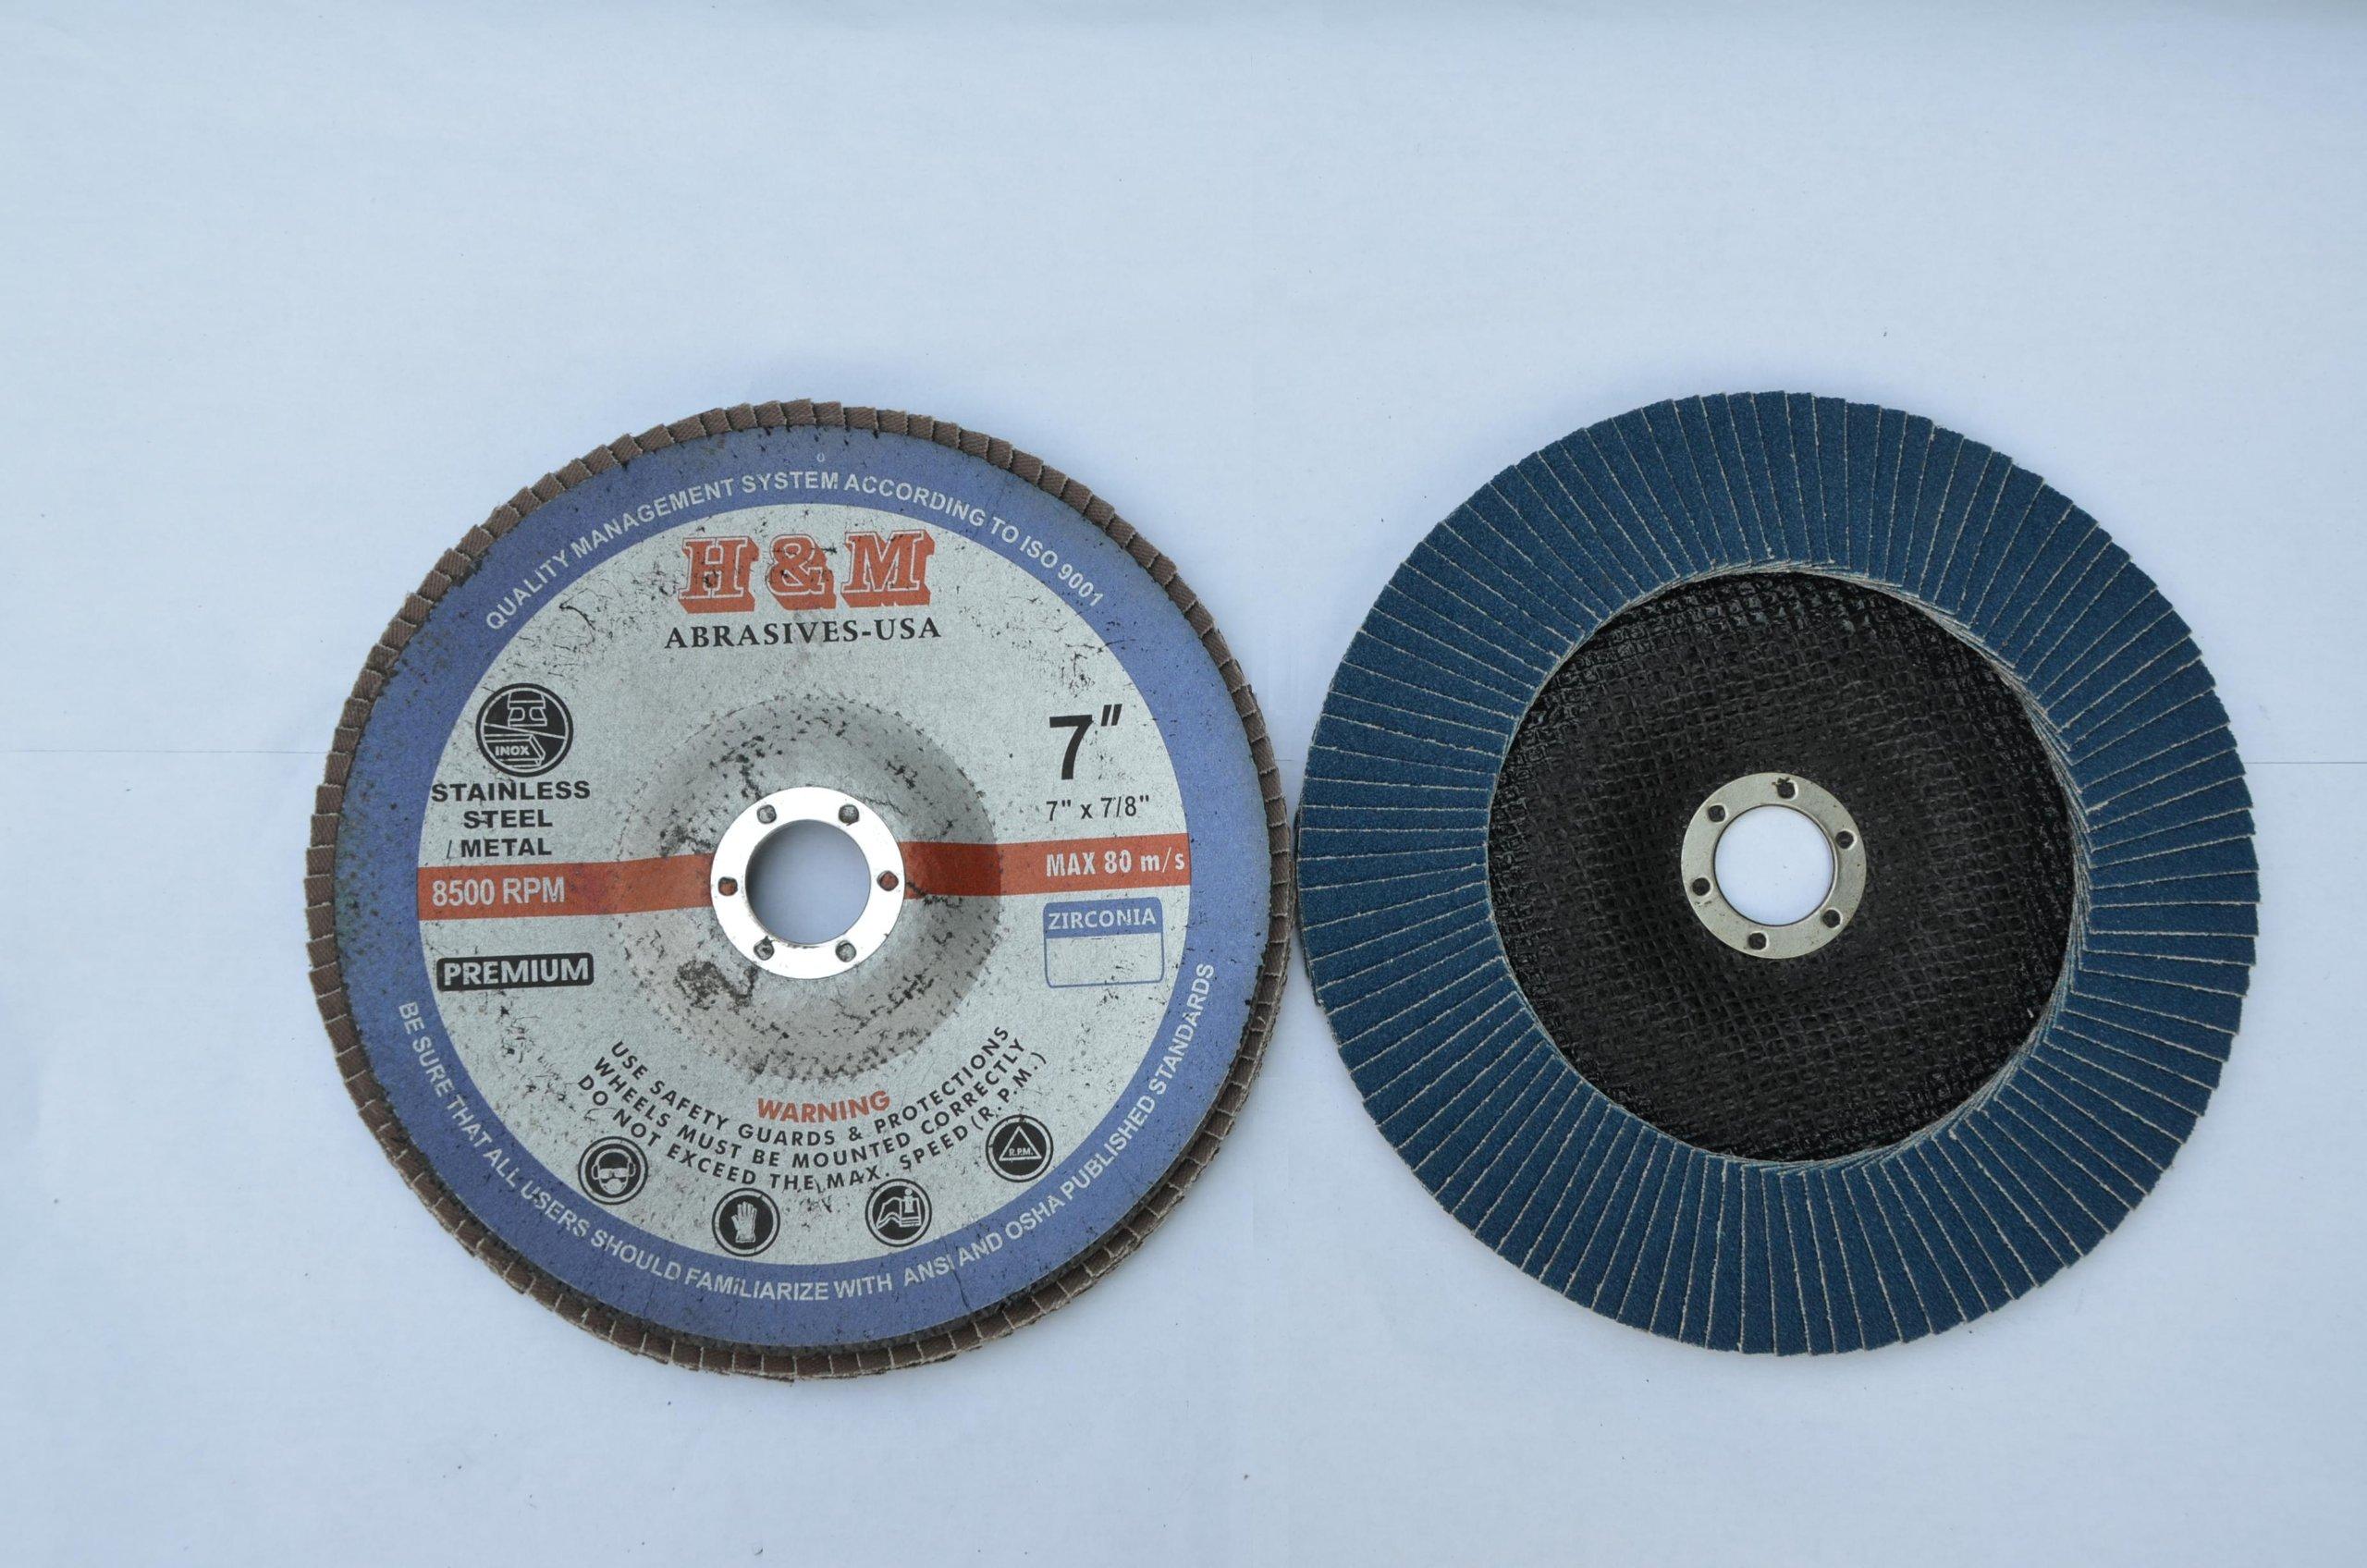 Premium FLAP DISCS 7'' x 7/8'' Zirconia 120 grit Grinding Wheel grinder tool - 5pcs Pack